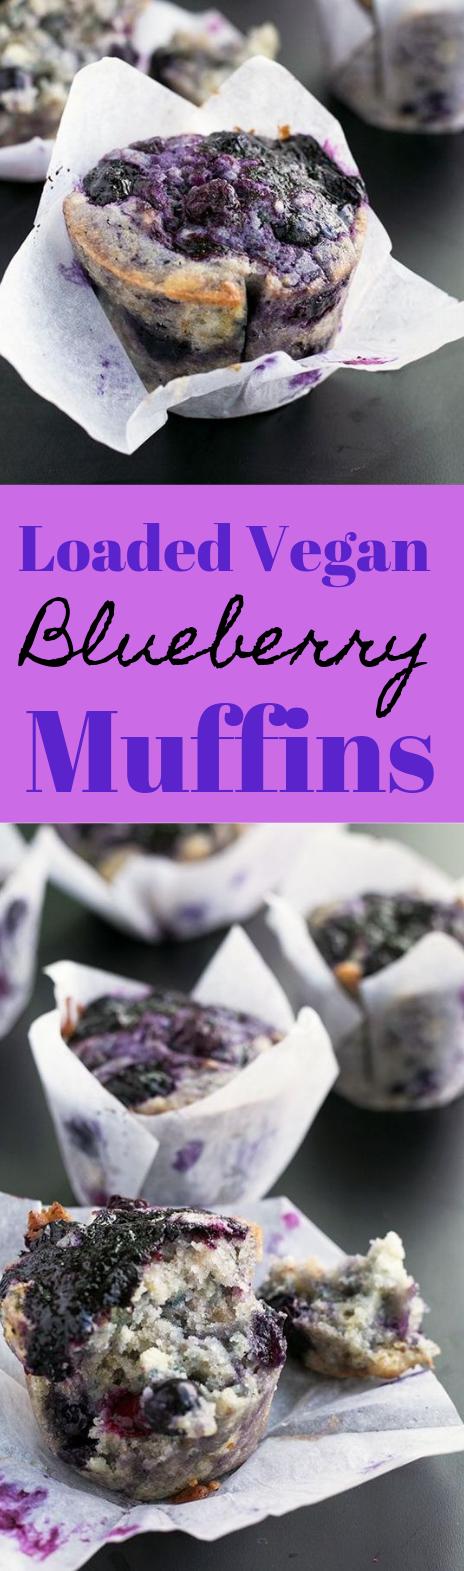 LOADED VEGAN BLUEBERRY MUFFINS #vegan #cake